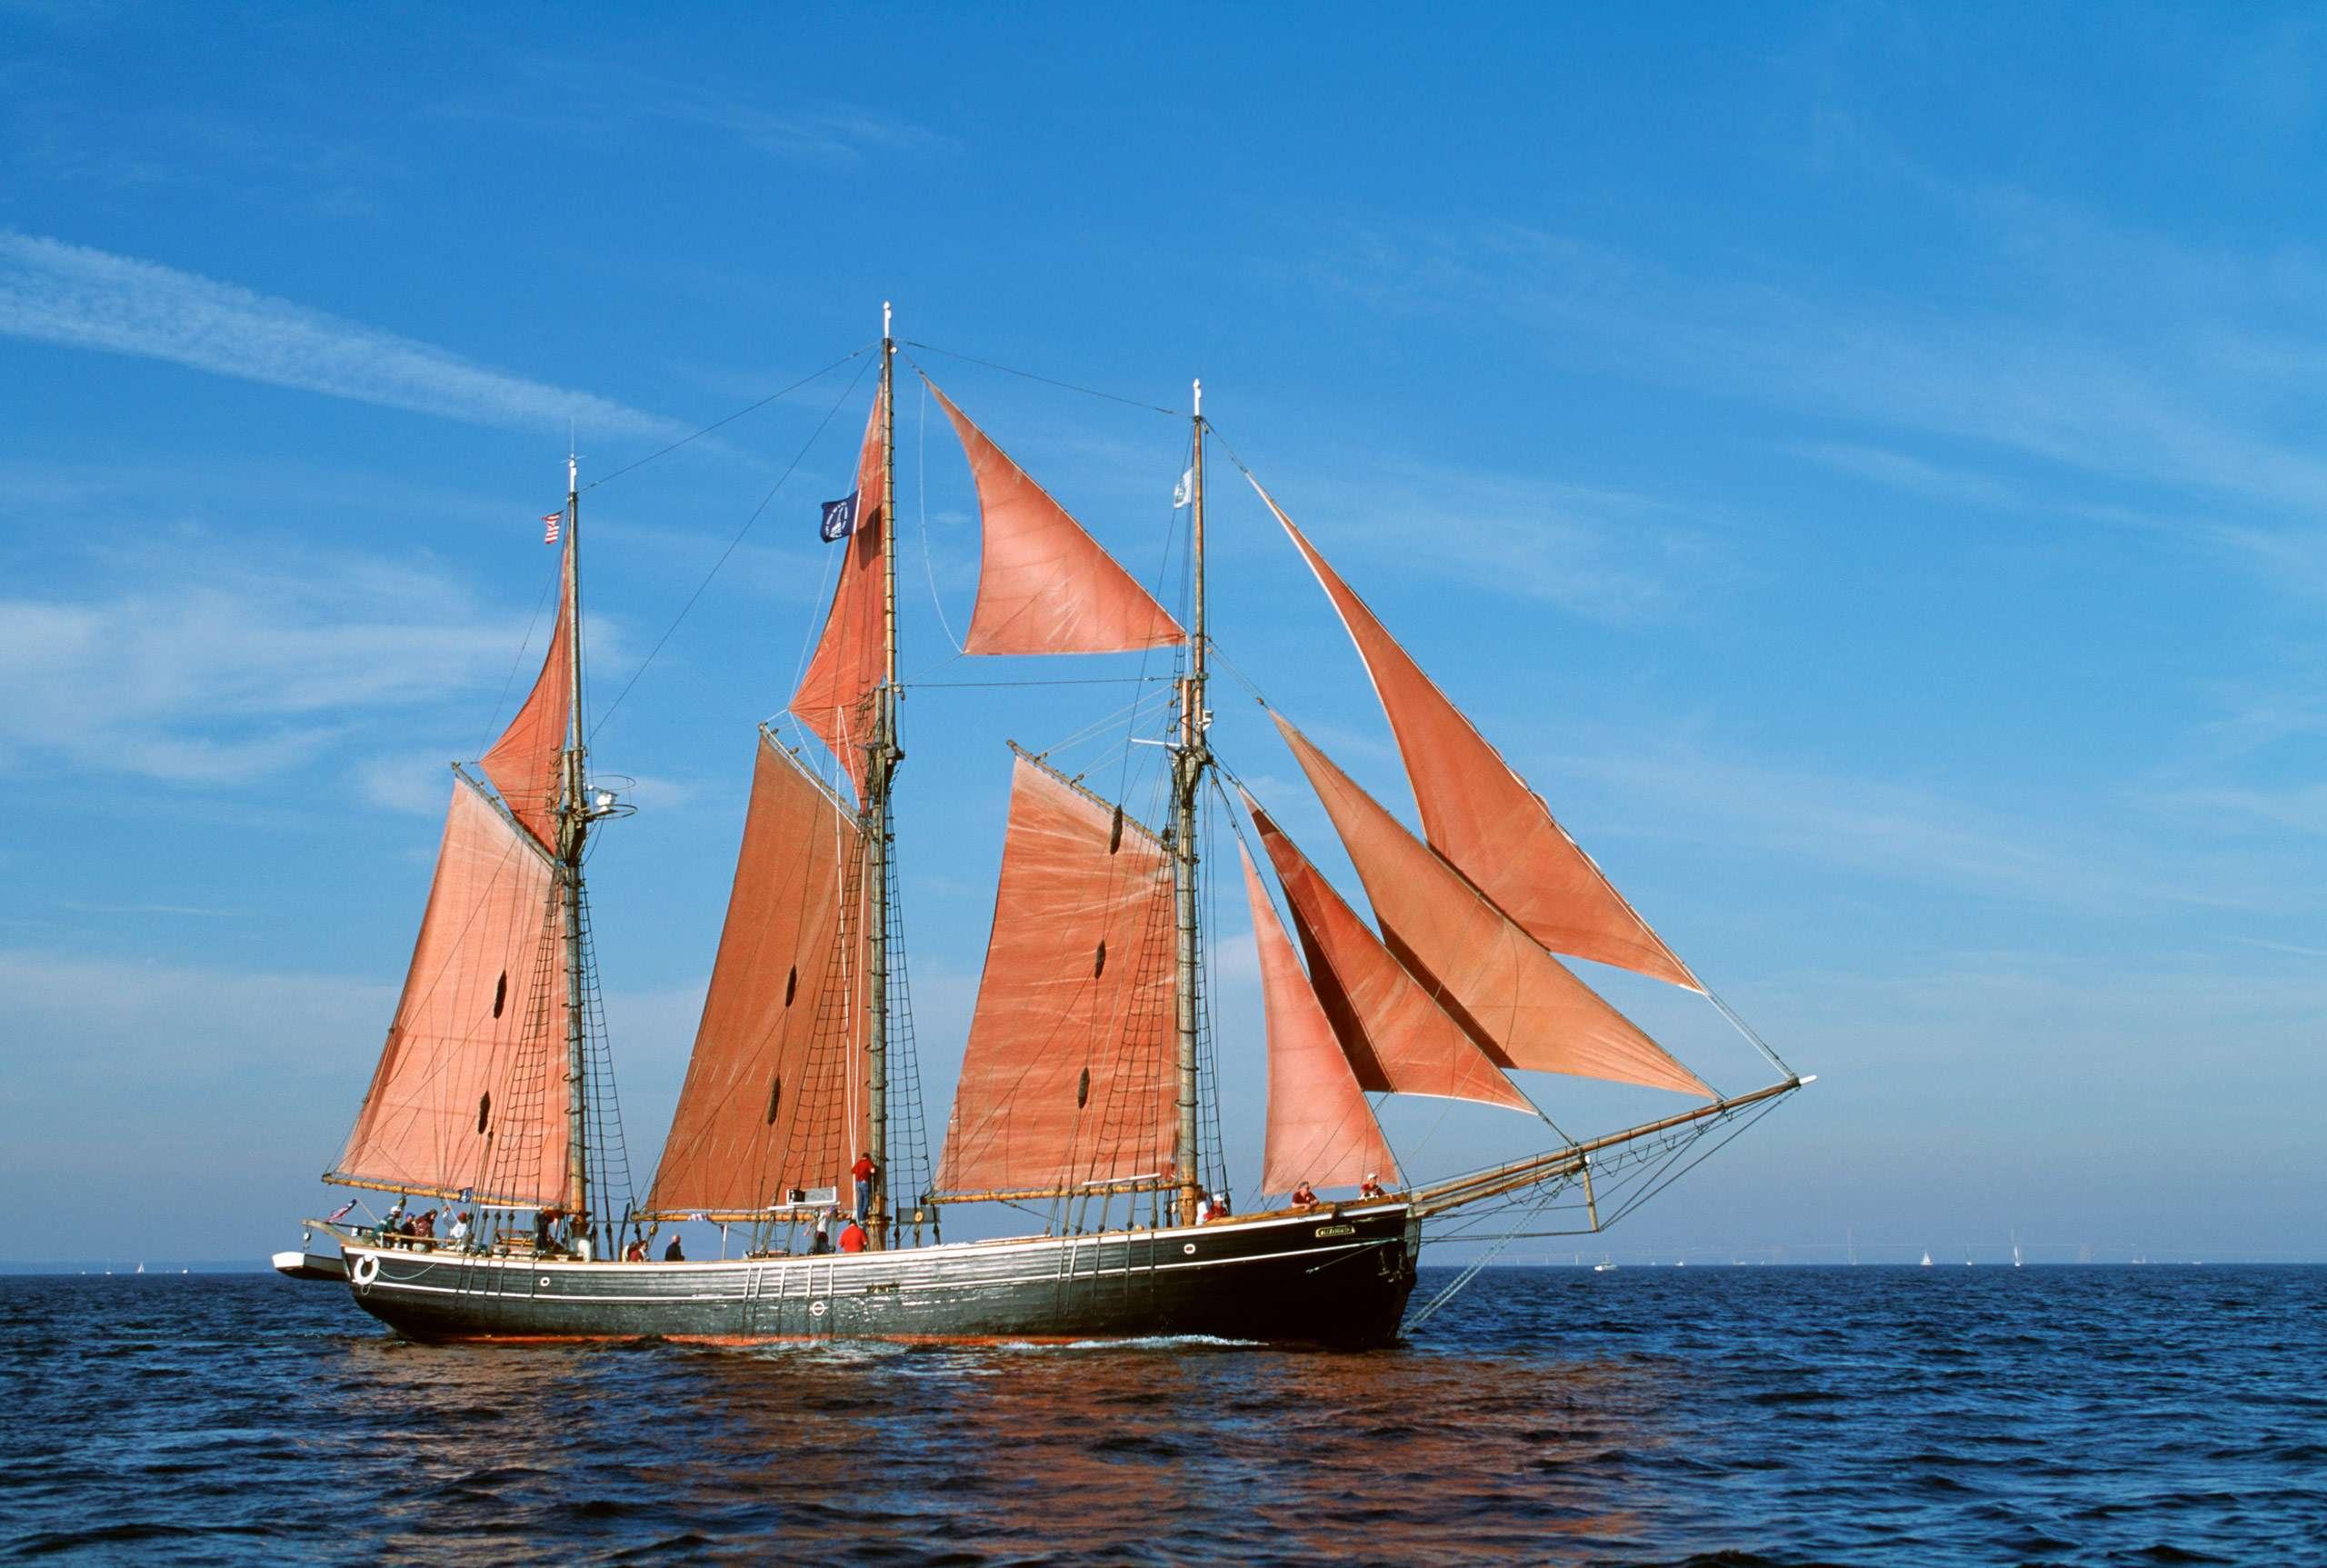 PORTFOLIO - Sailing - Windjammers #27    PCG260